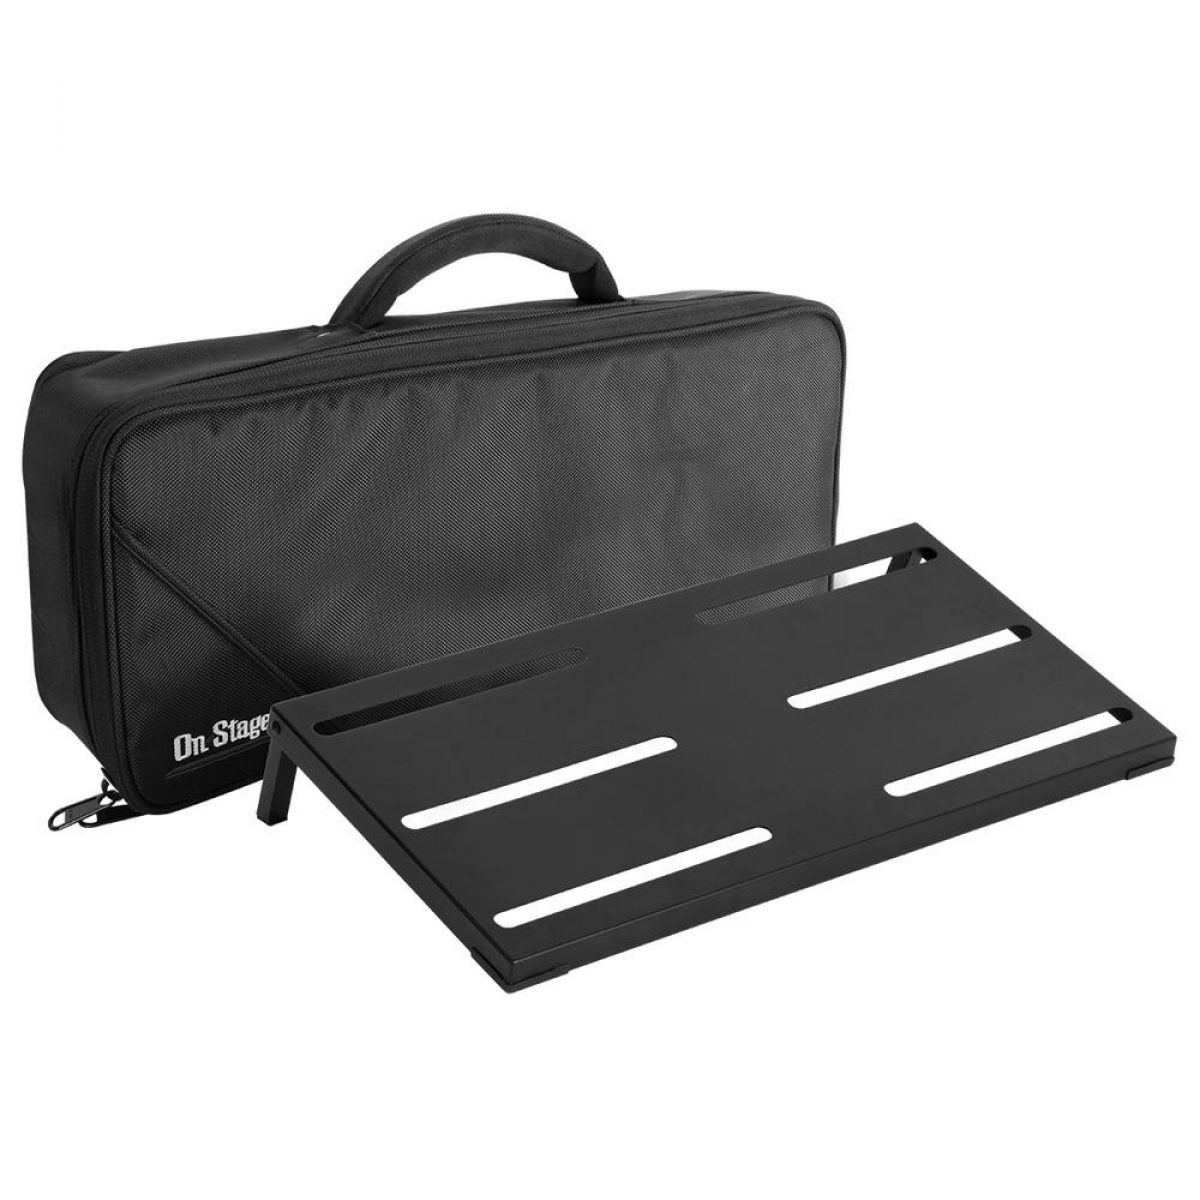 on stage gpb4000 guitar keyboard pedal board. Black Bedroom Furniture Sets. Home Design Ideas